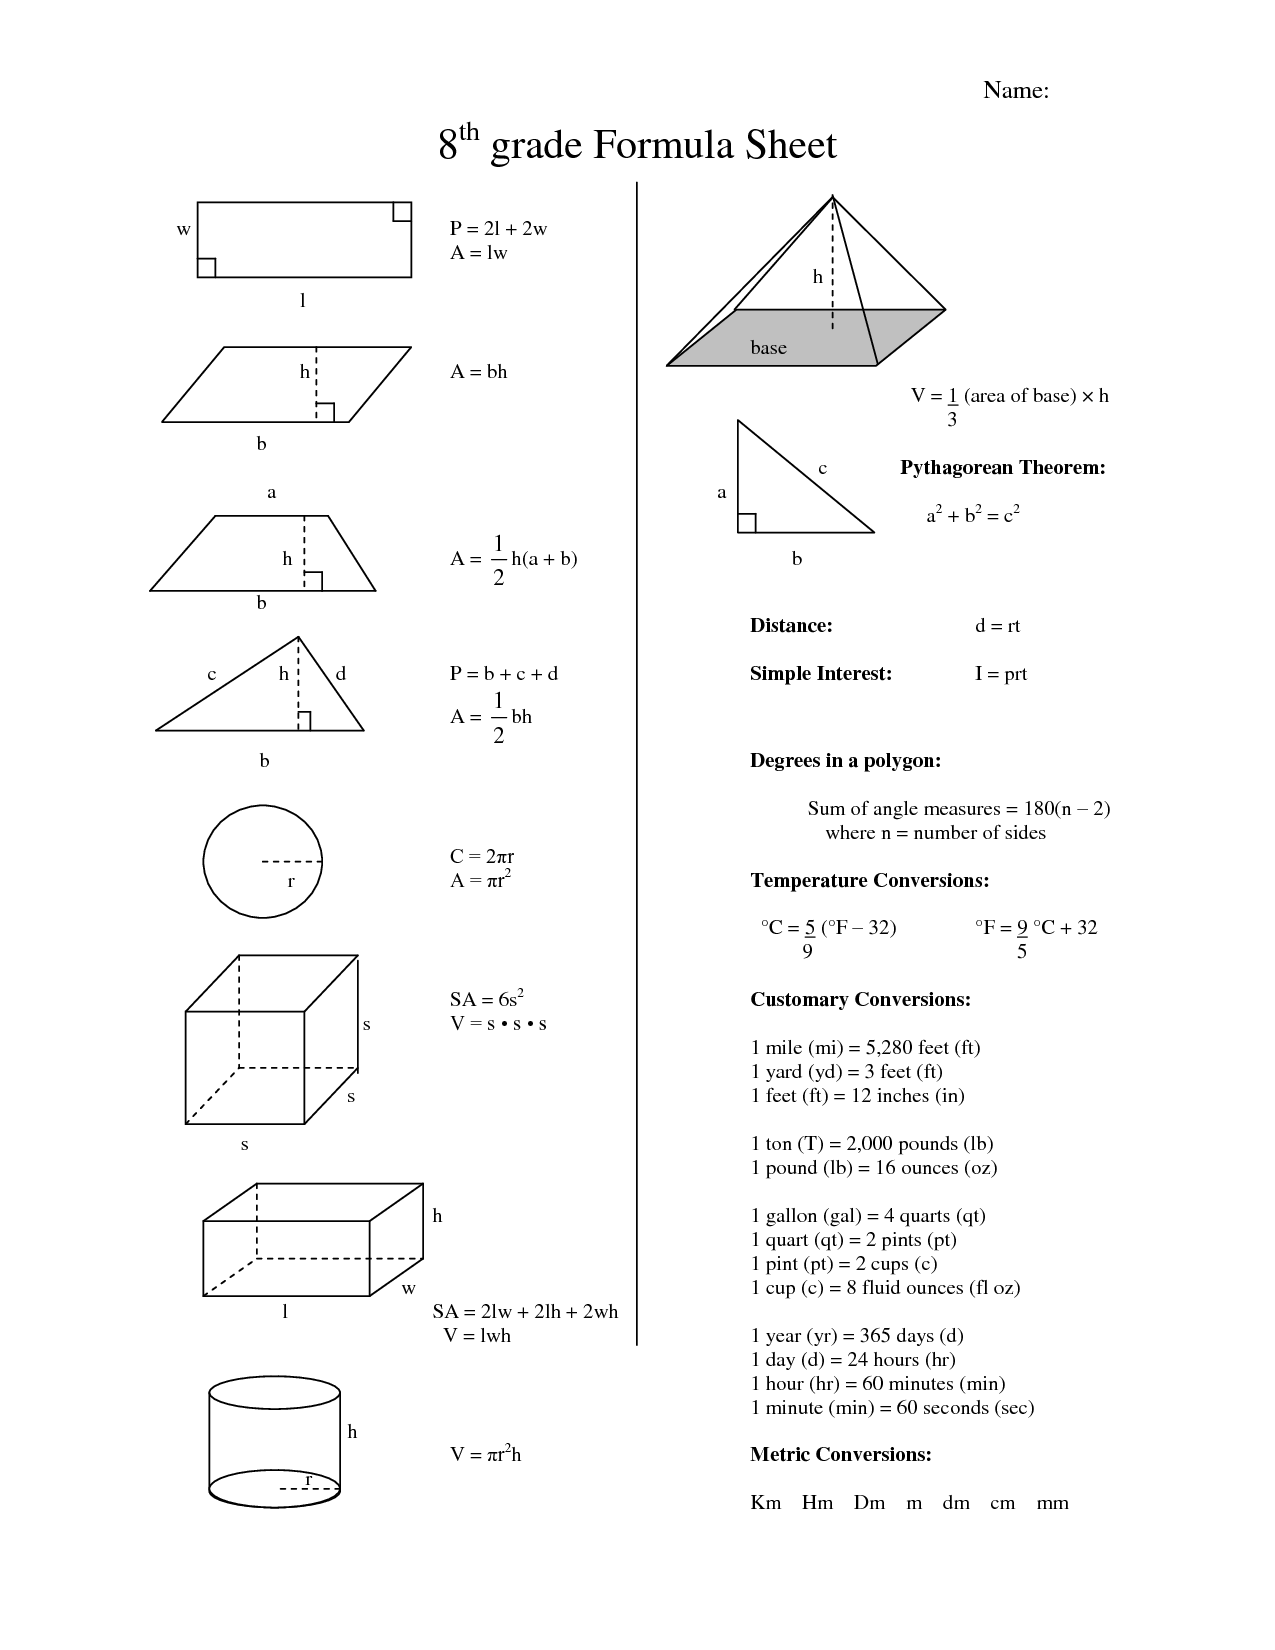 Eighth grade math formula chart 8th grade formula sheet eighth grade math formula chart 8th grade formula sheet biocorpaavc